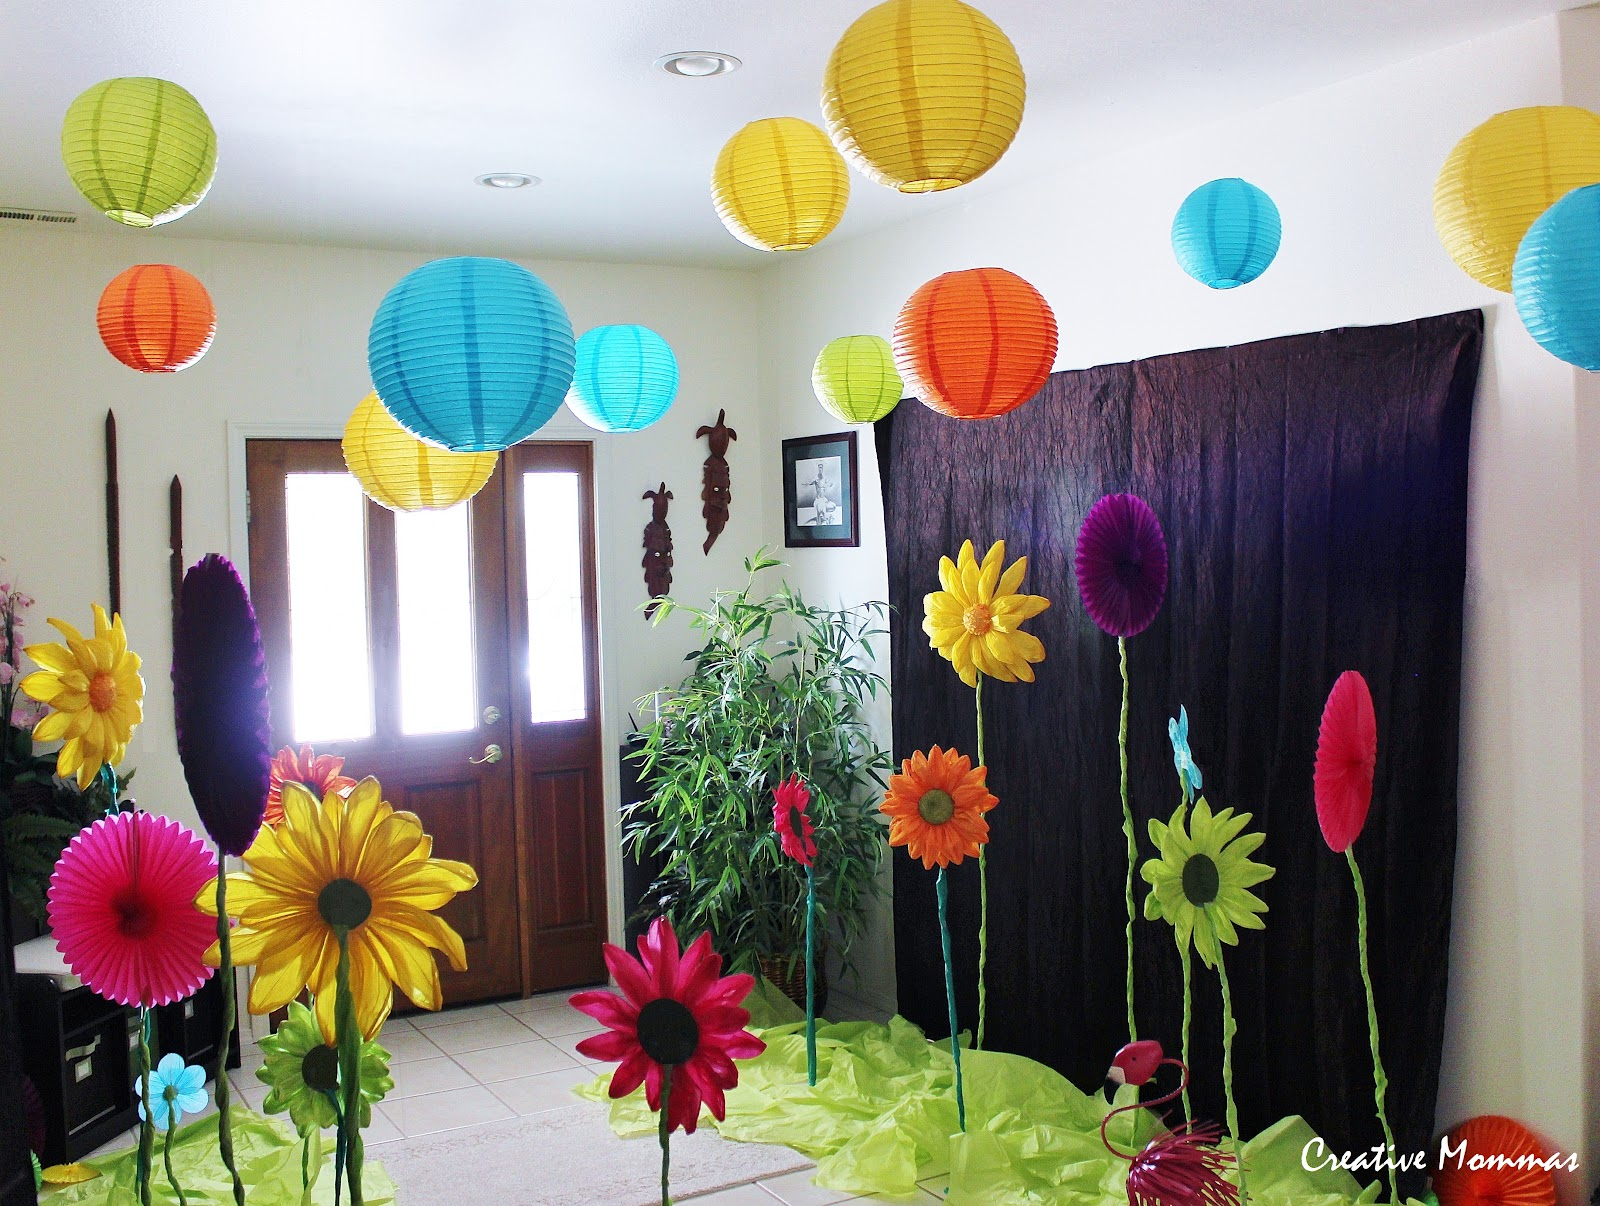 creative mommas alice in wonderland birthday party. Black Bedroom Furniture Sets. Home Design Ideas